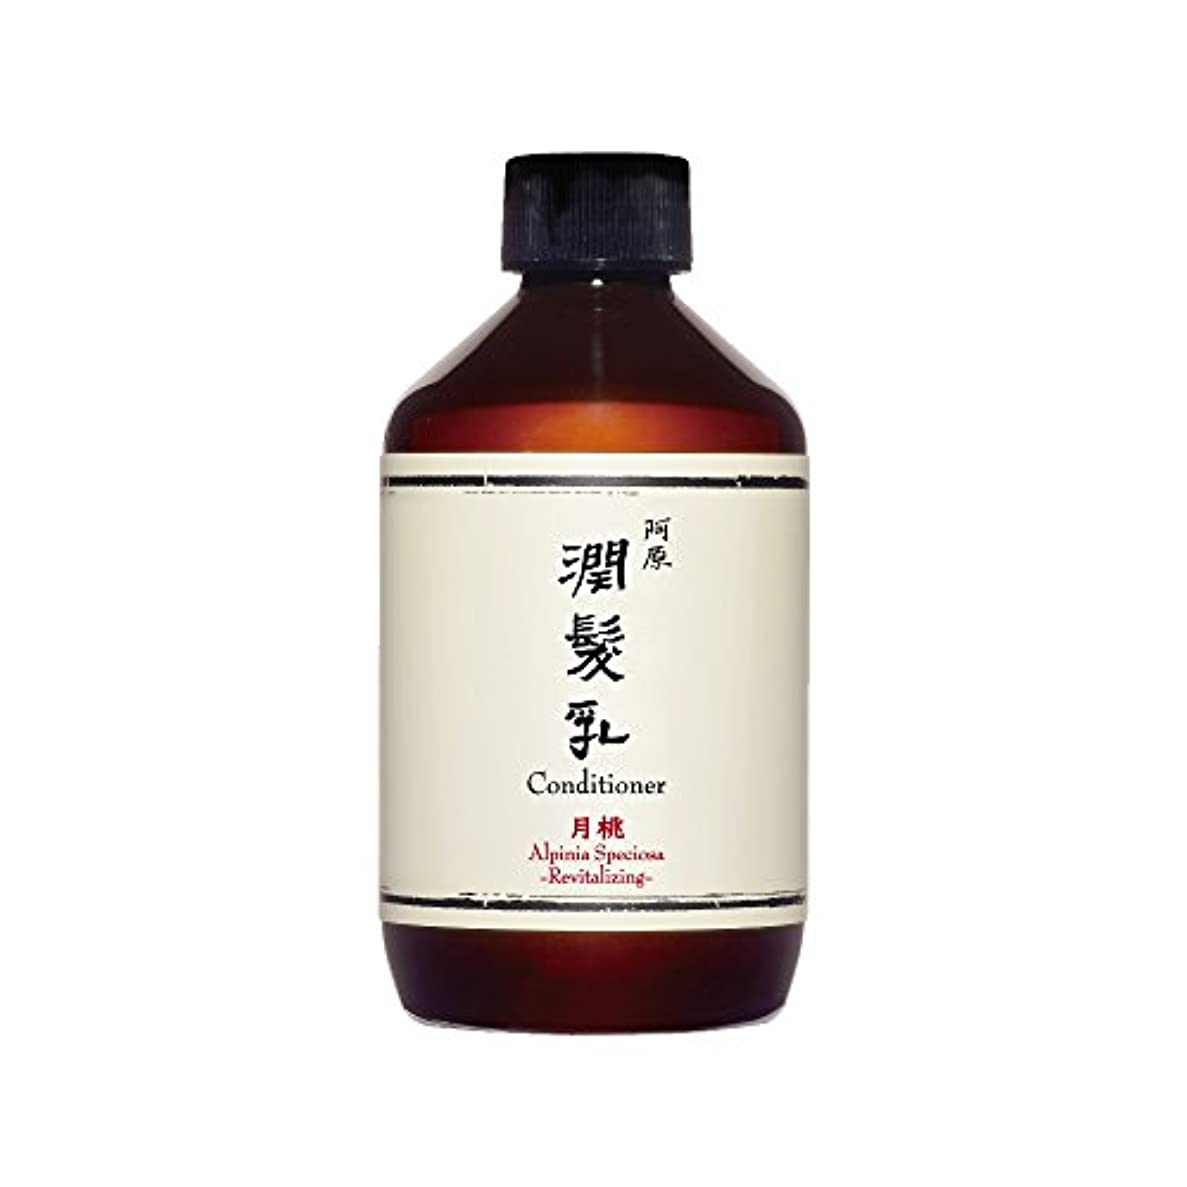 YUAN(ユアン) 月桃(ゲットウ)コンディショナー 50ml